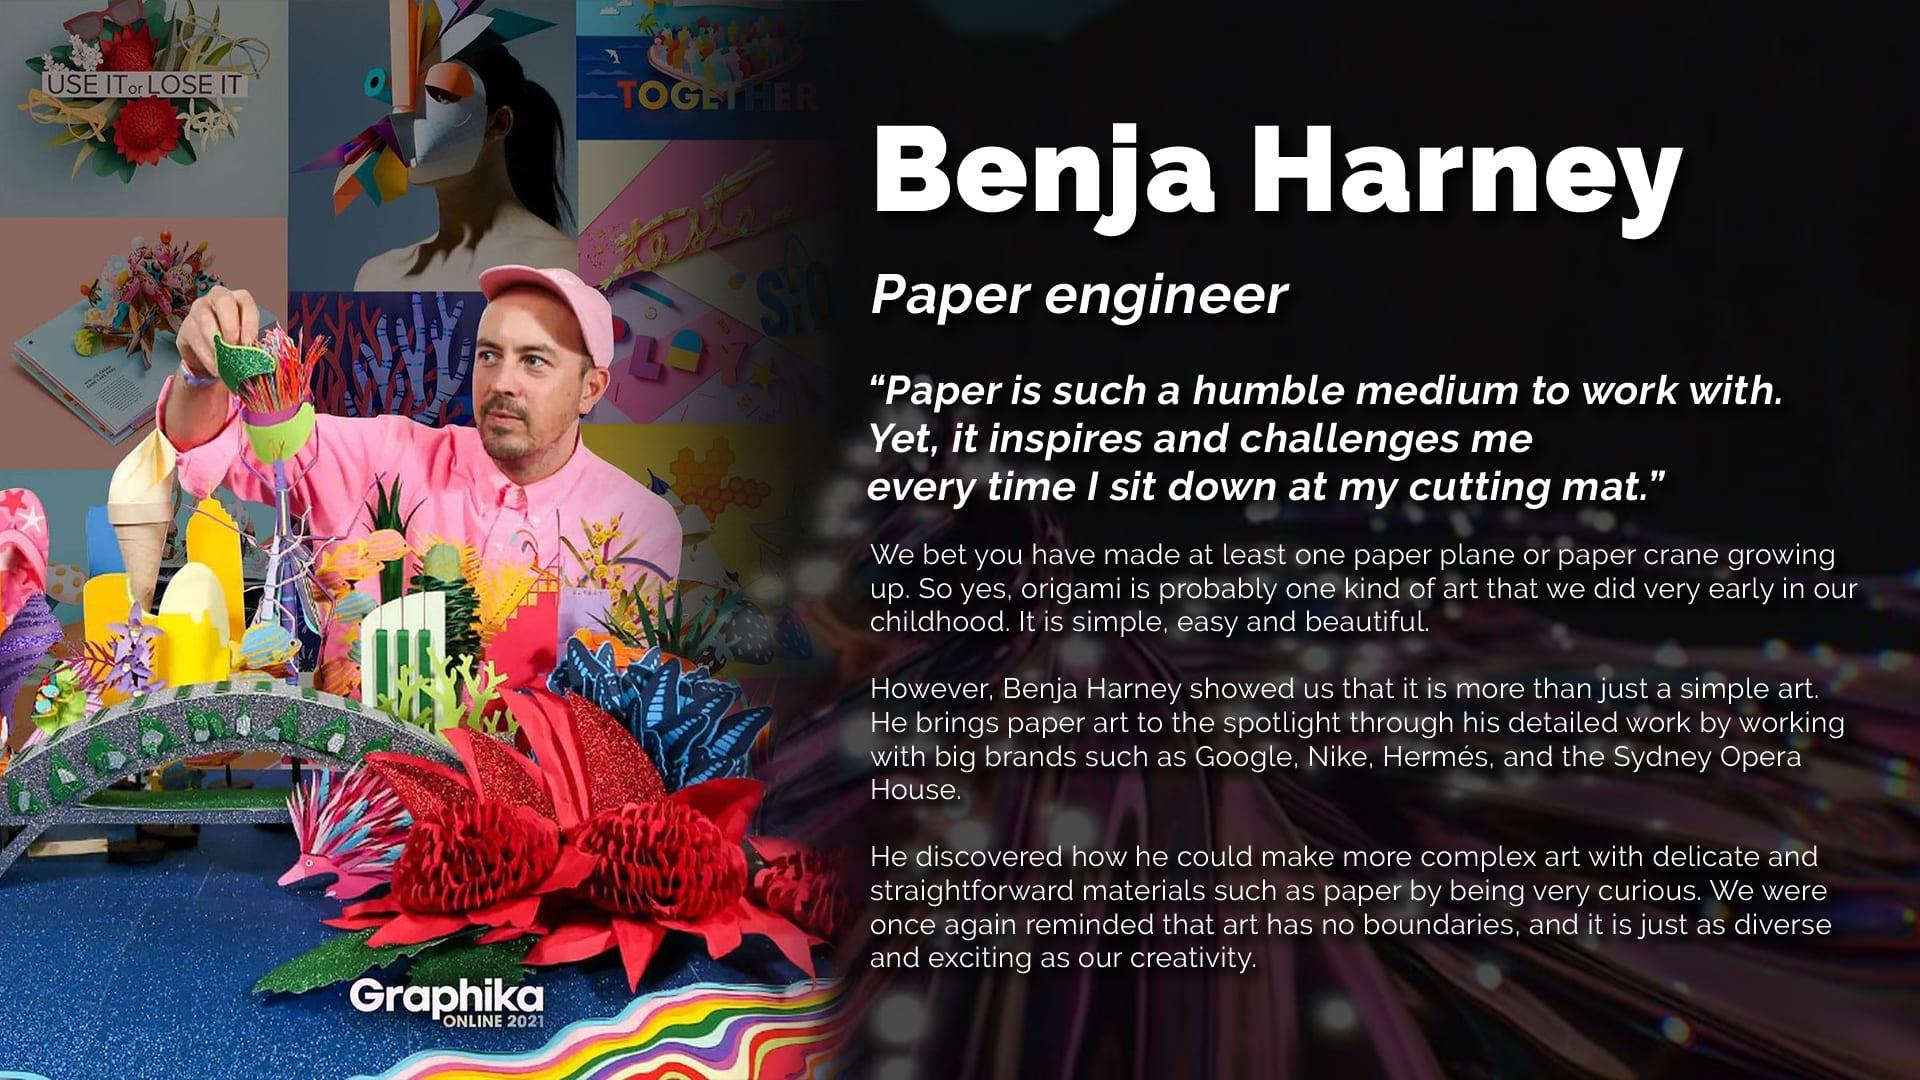 Benja Harney